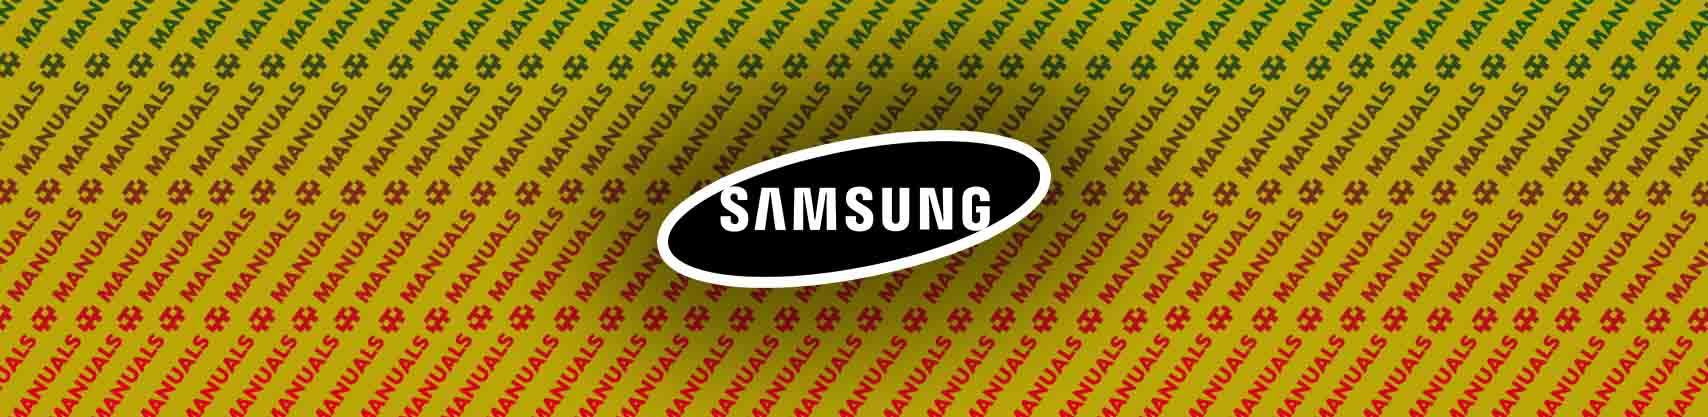 Samsung HW-K360 Manual